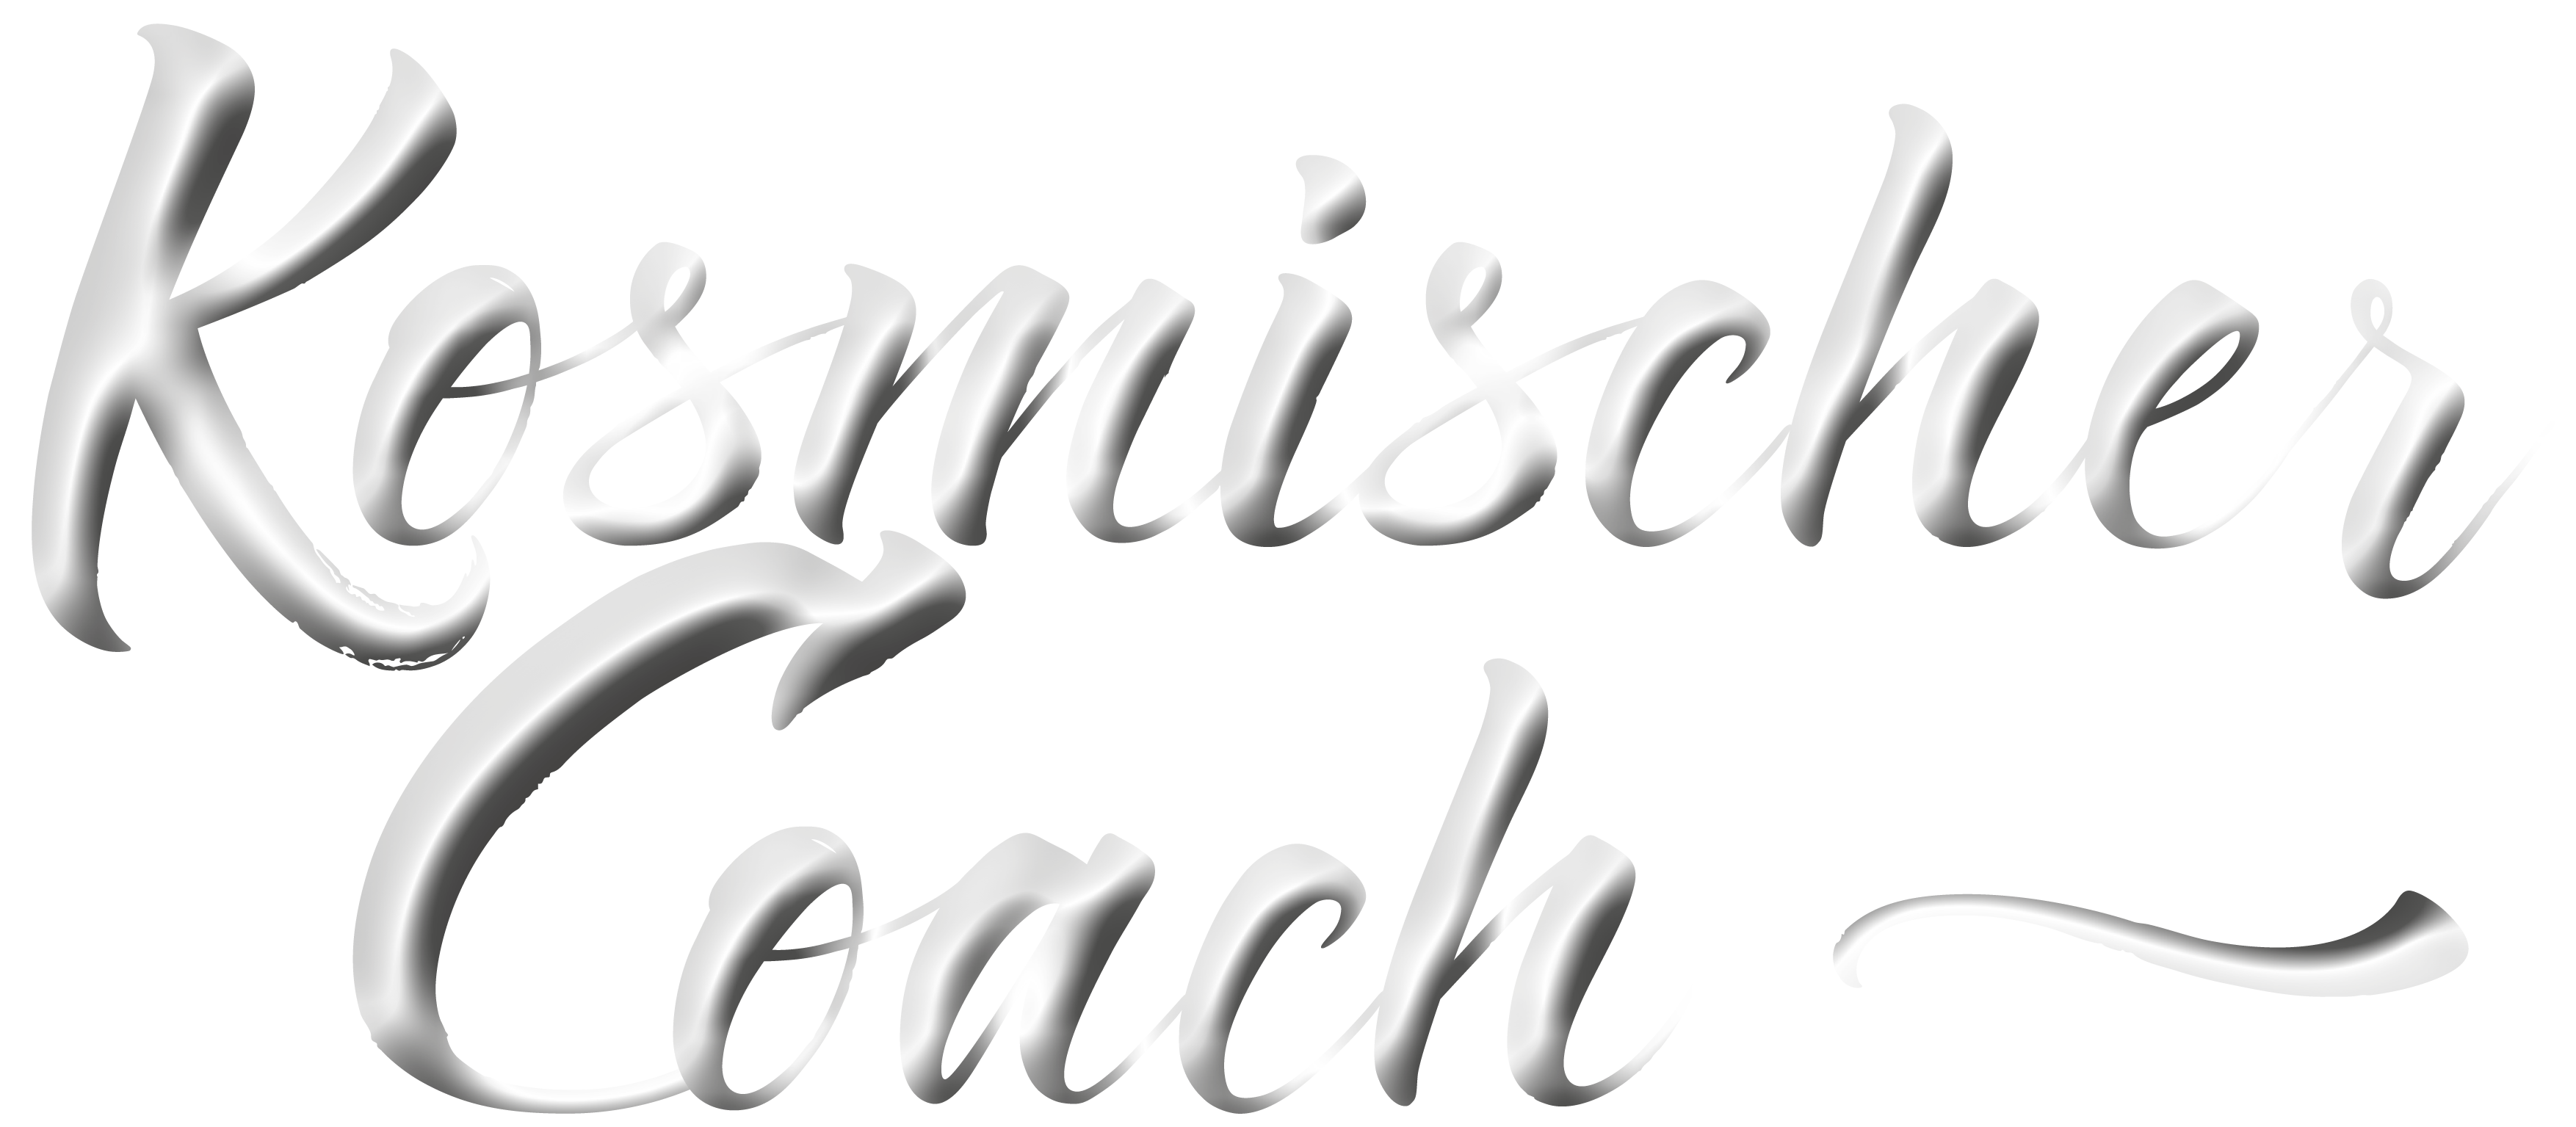 Bewusstseins Seminar, Energetiker Ausbildung, Tirol